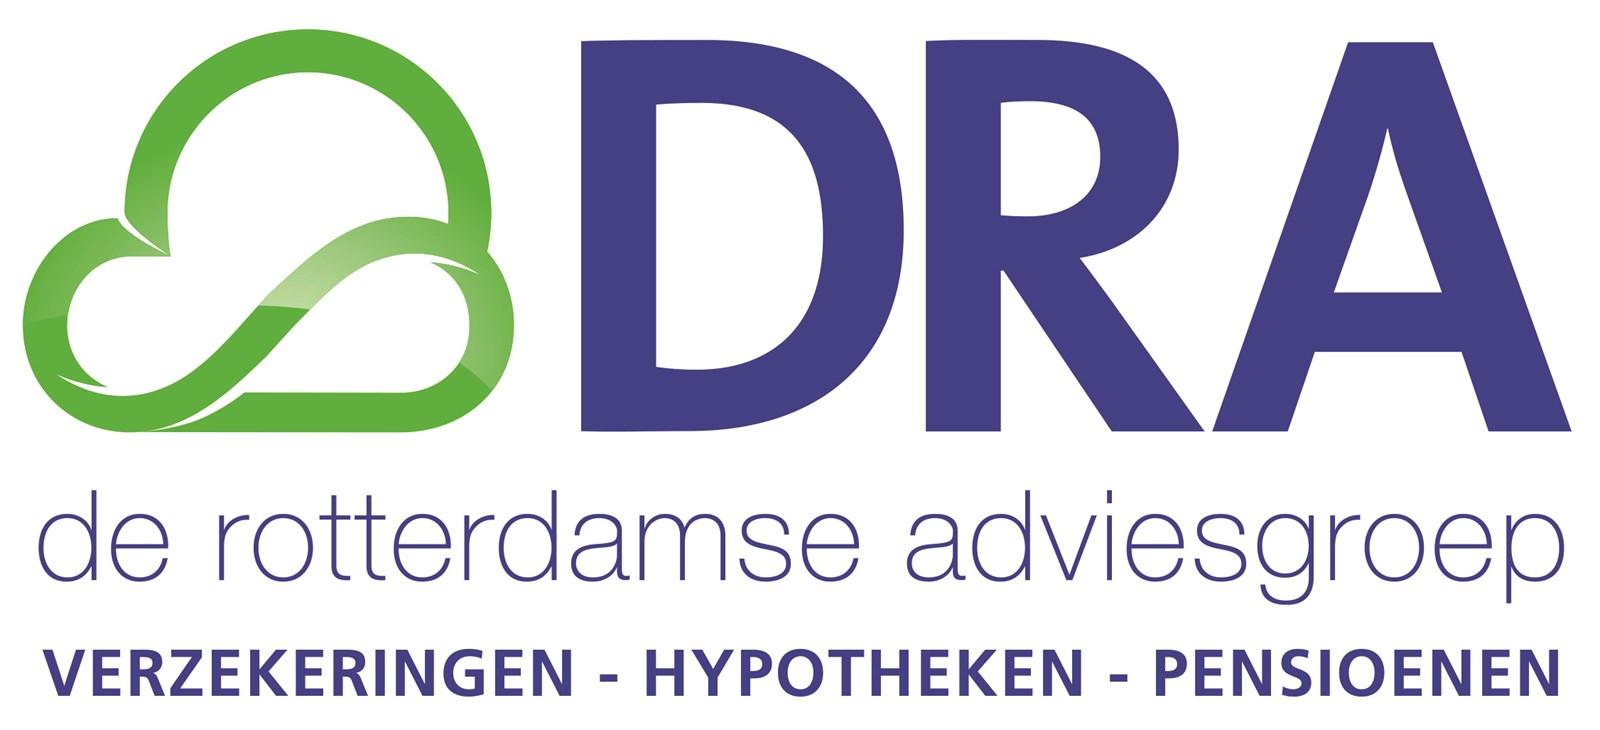 Afbeelding van De Rotterdamse Adviesgroep (DRA)